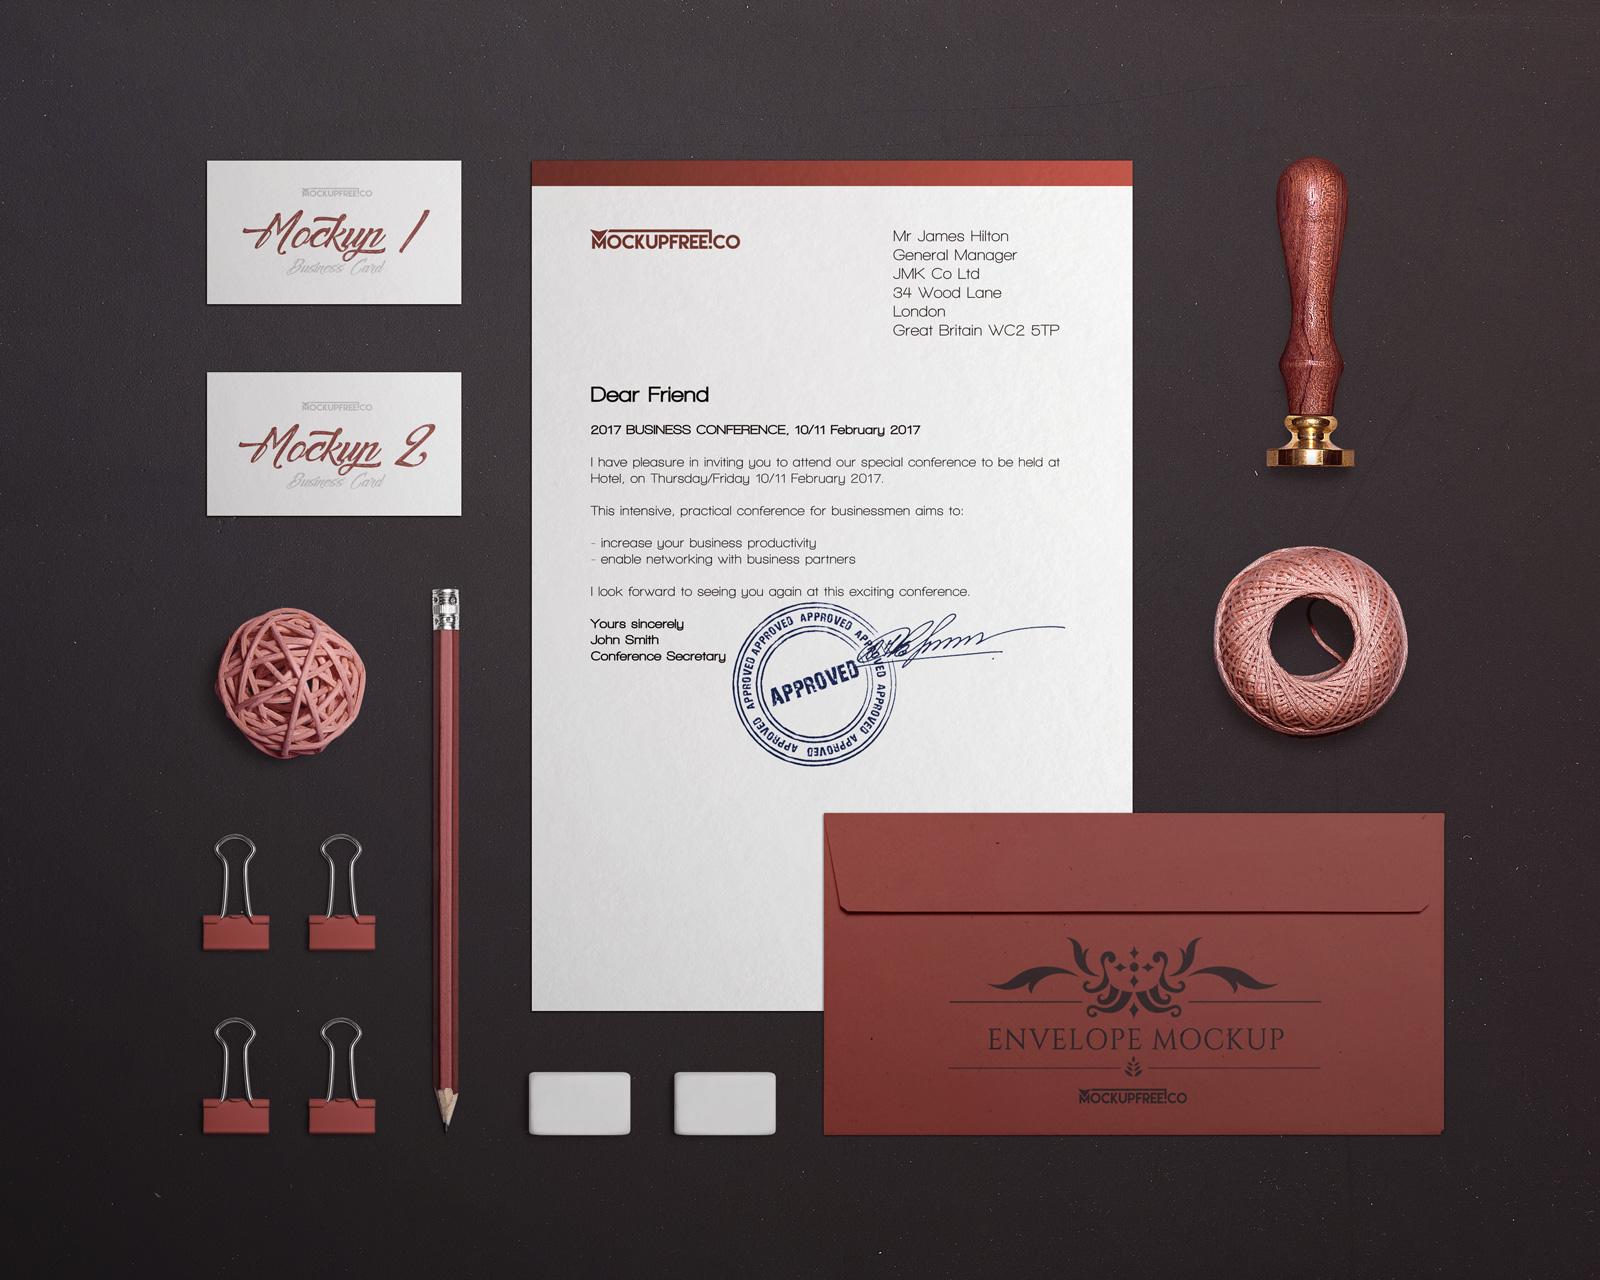 2-Free-Premium-Stationery-Mockup-PSD-Files-2